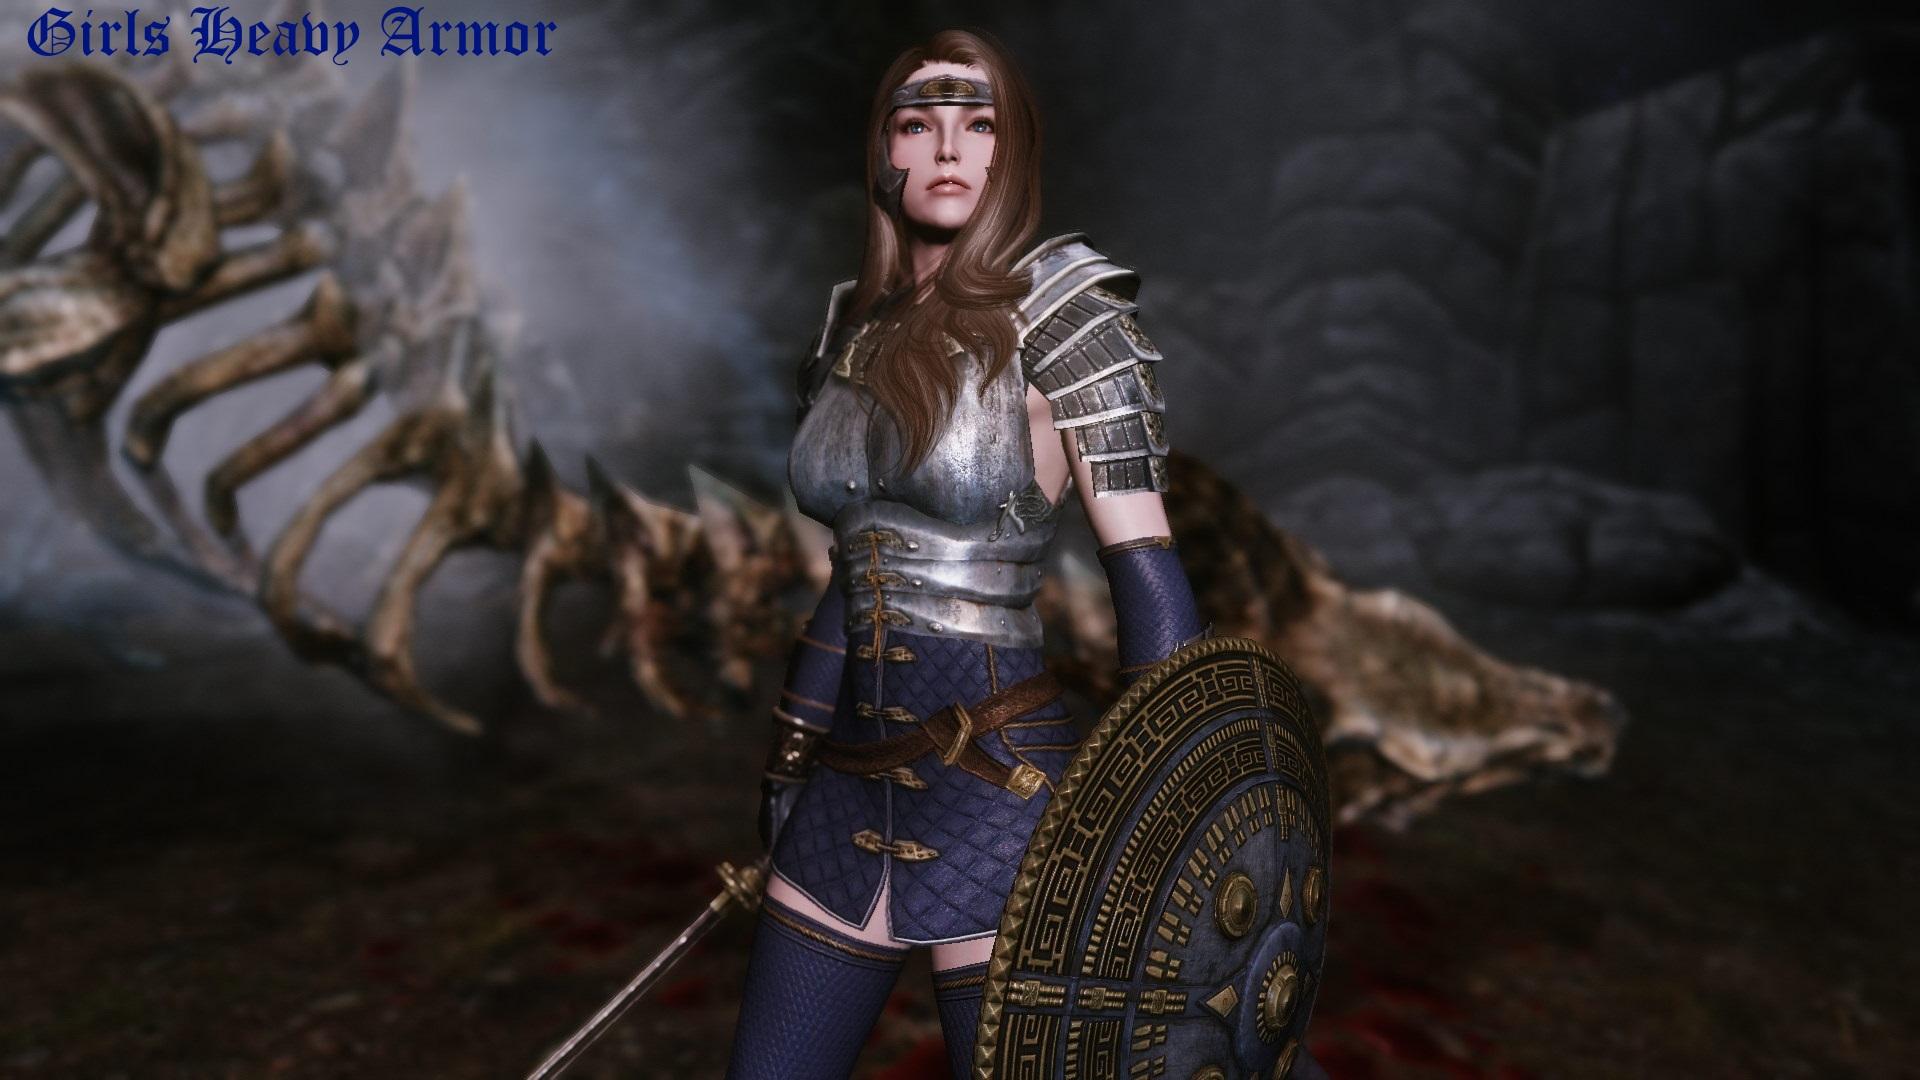 Girls_Heavy_Armor_01.jpeg